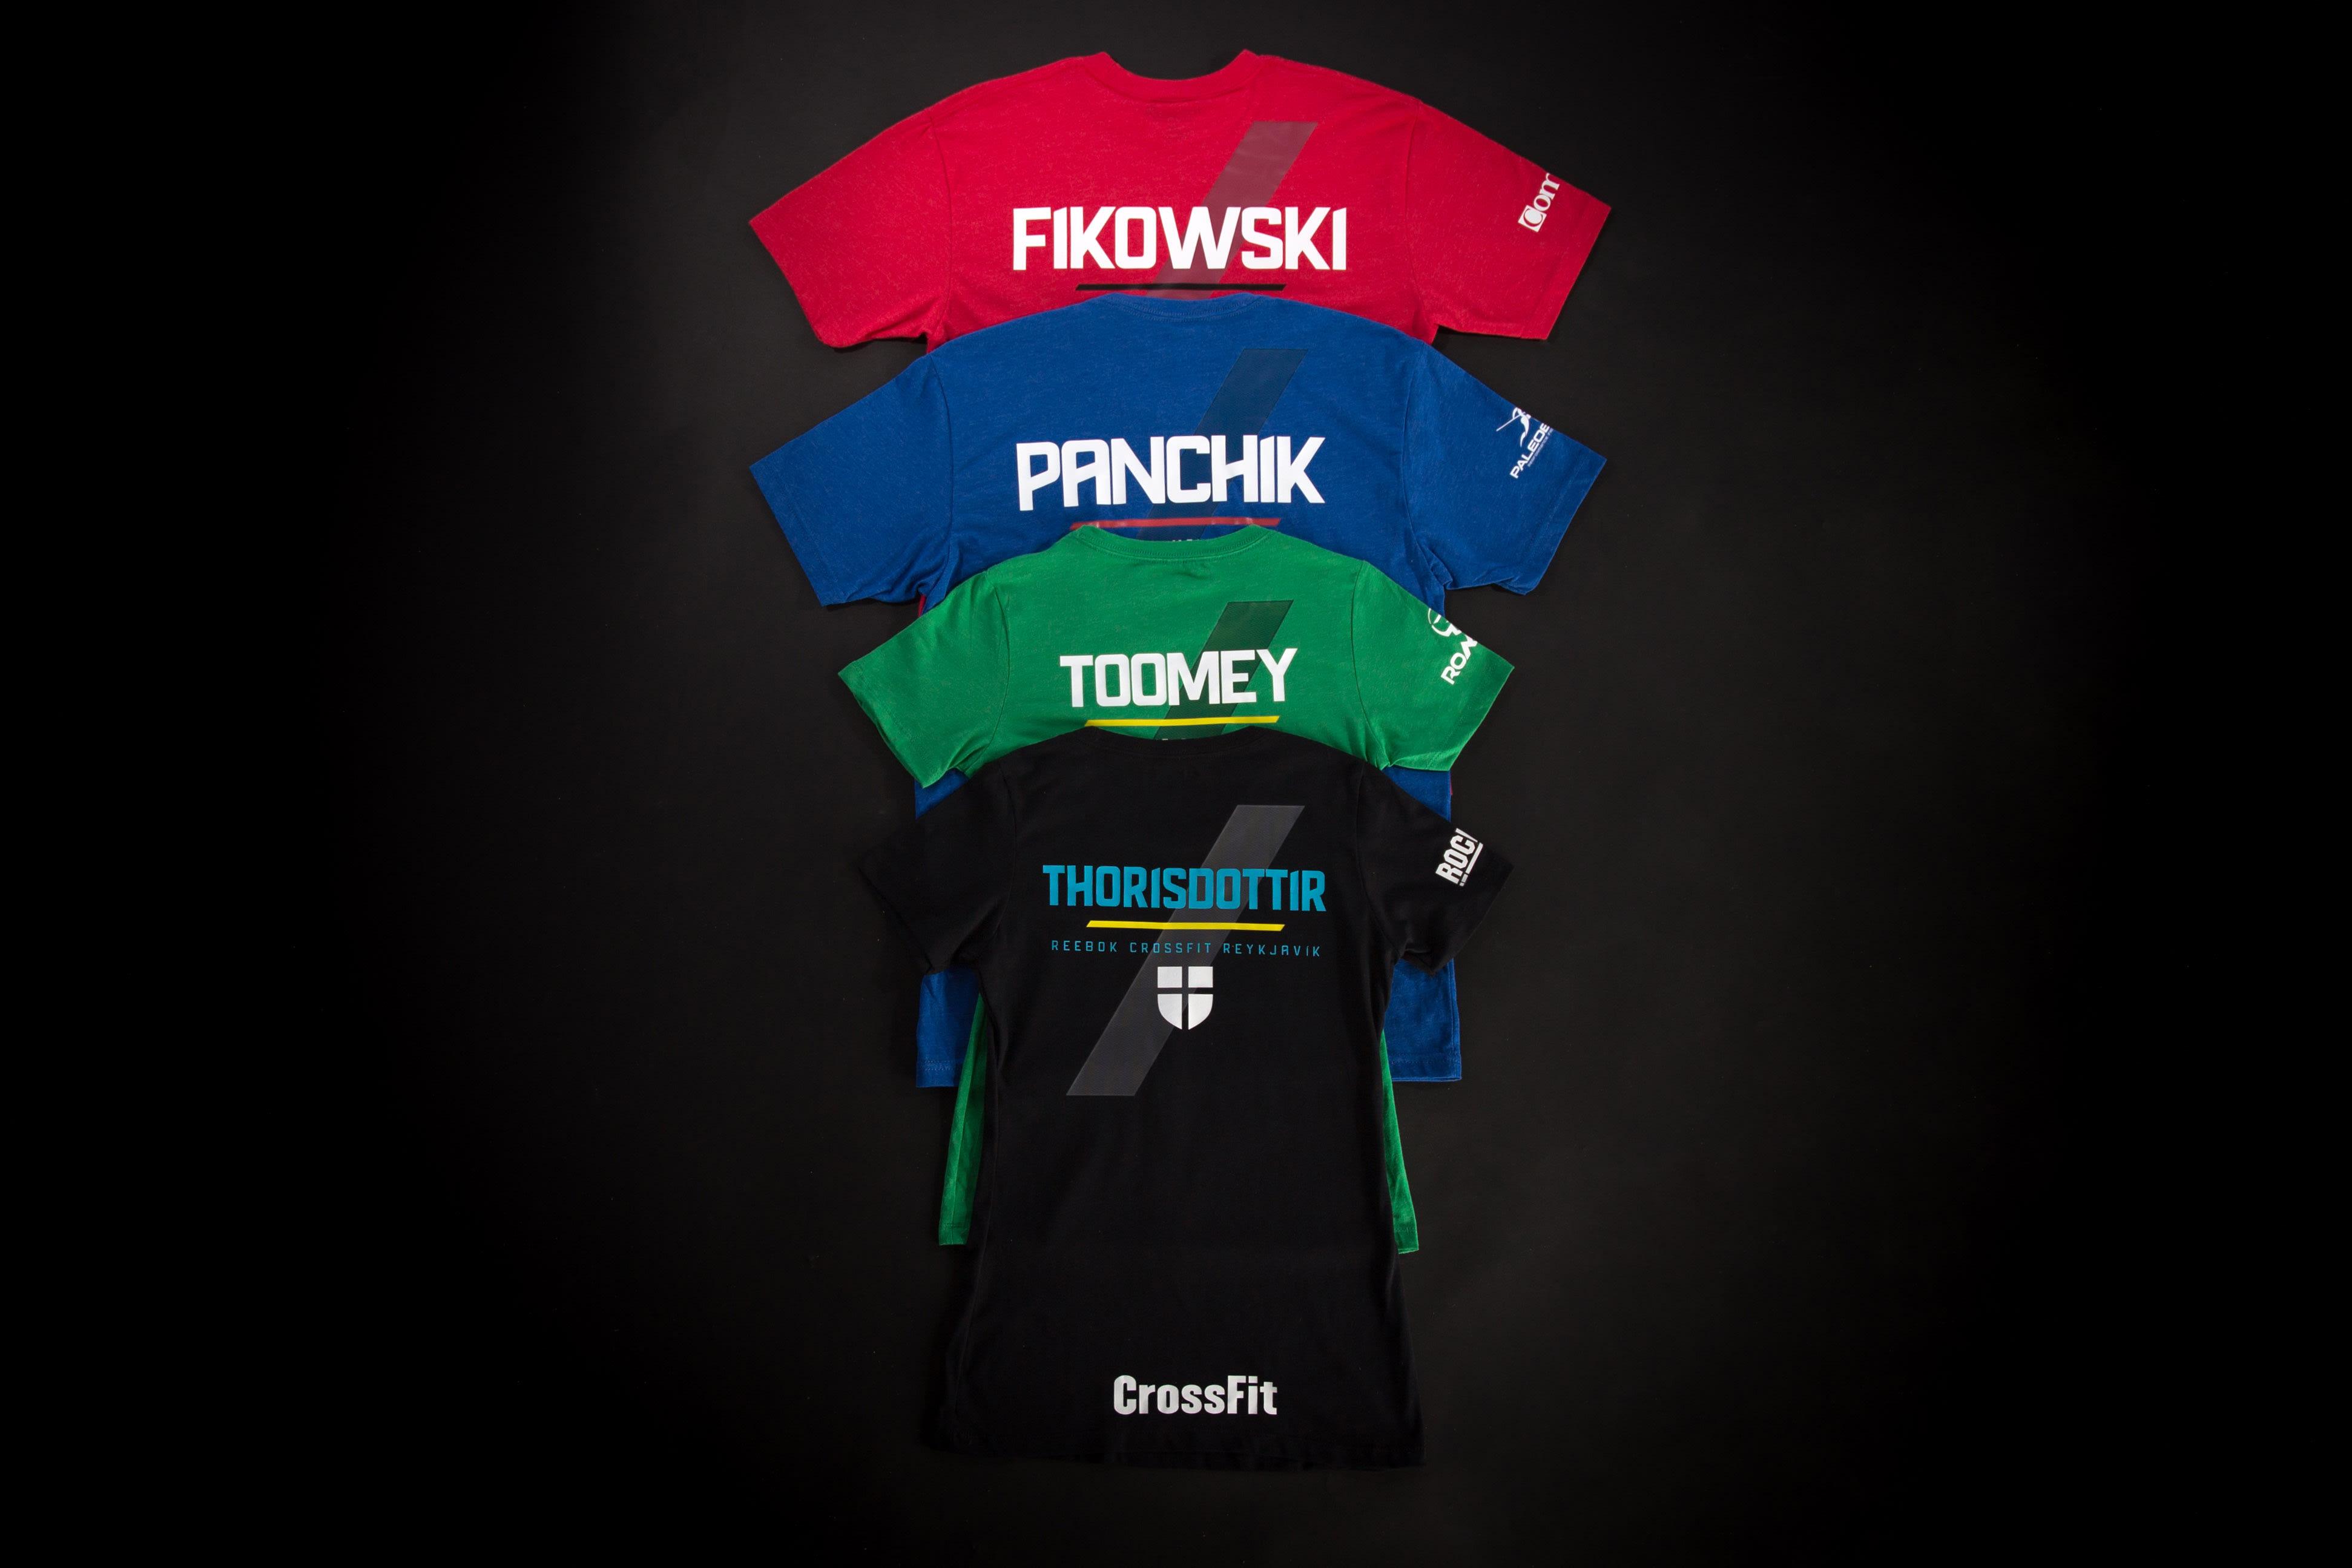 crossfit-invitational-jersey-athletes